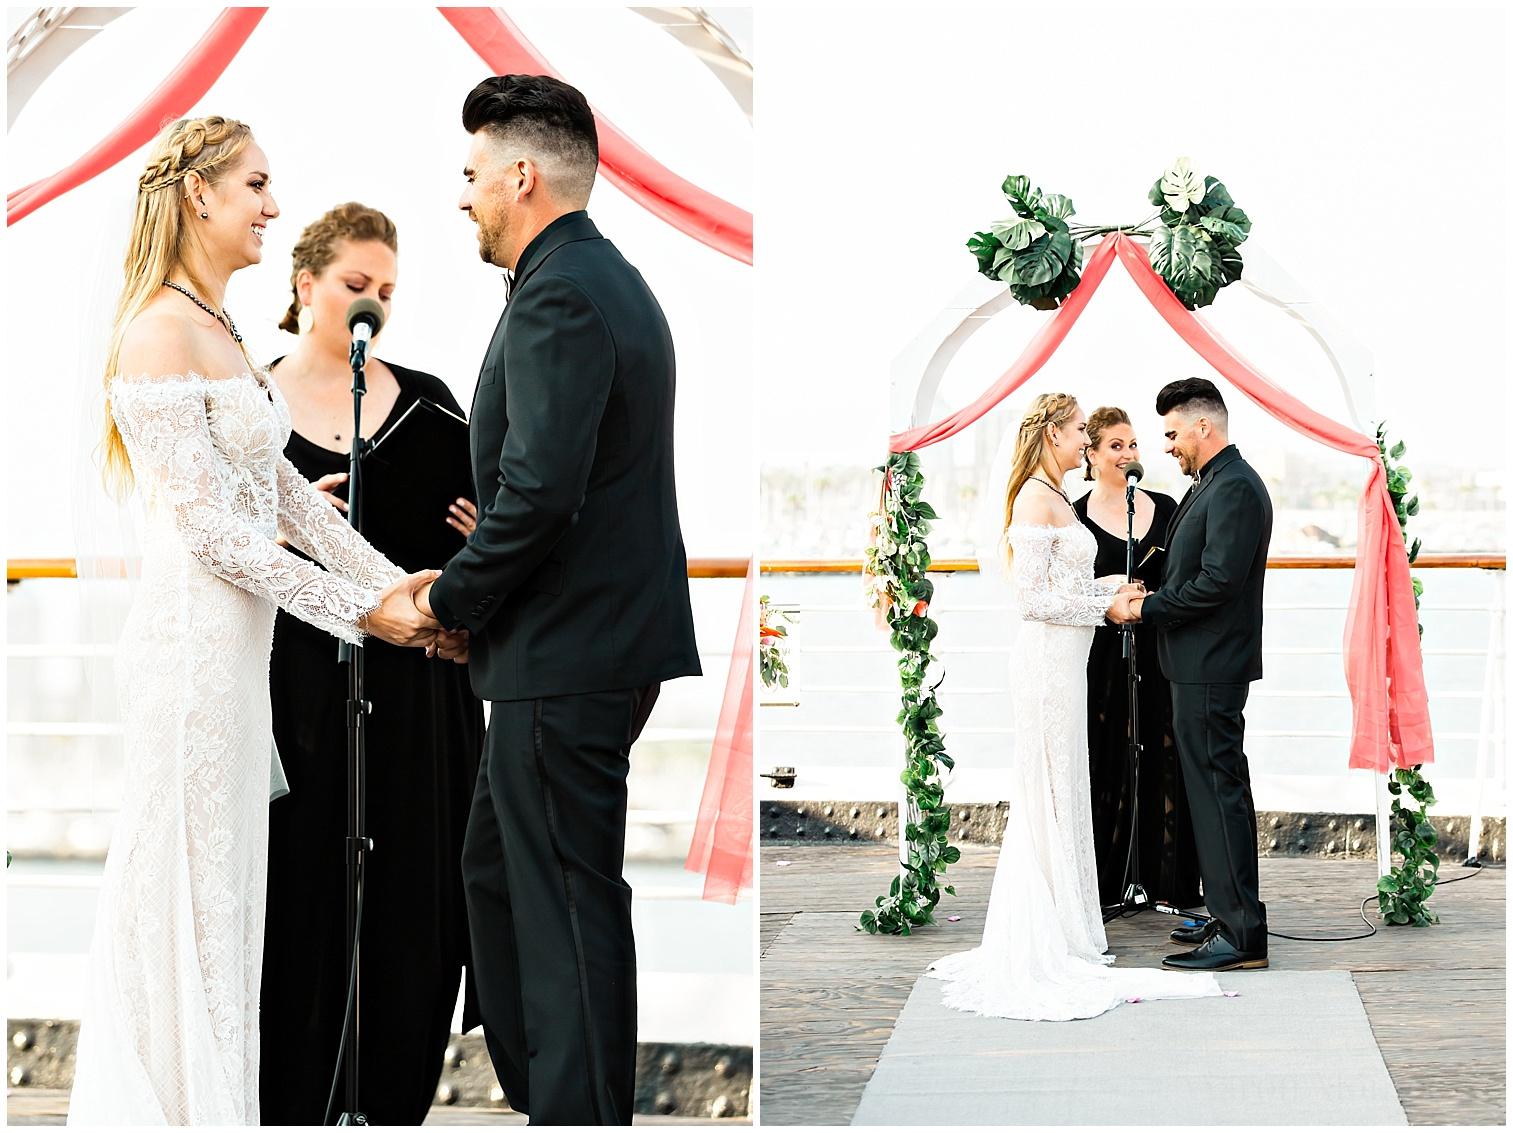 Queen_Mary_Long_Beach_Wedding_Photography_0475.jpg